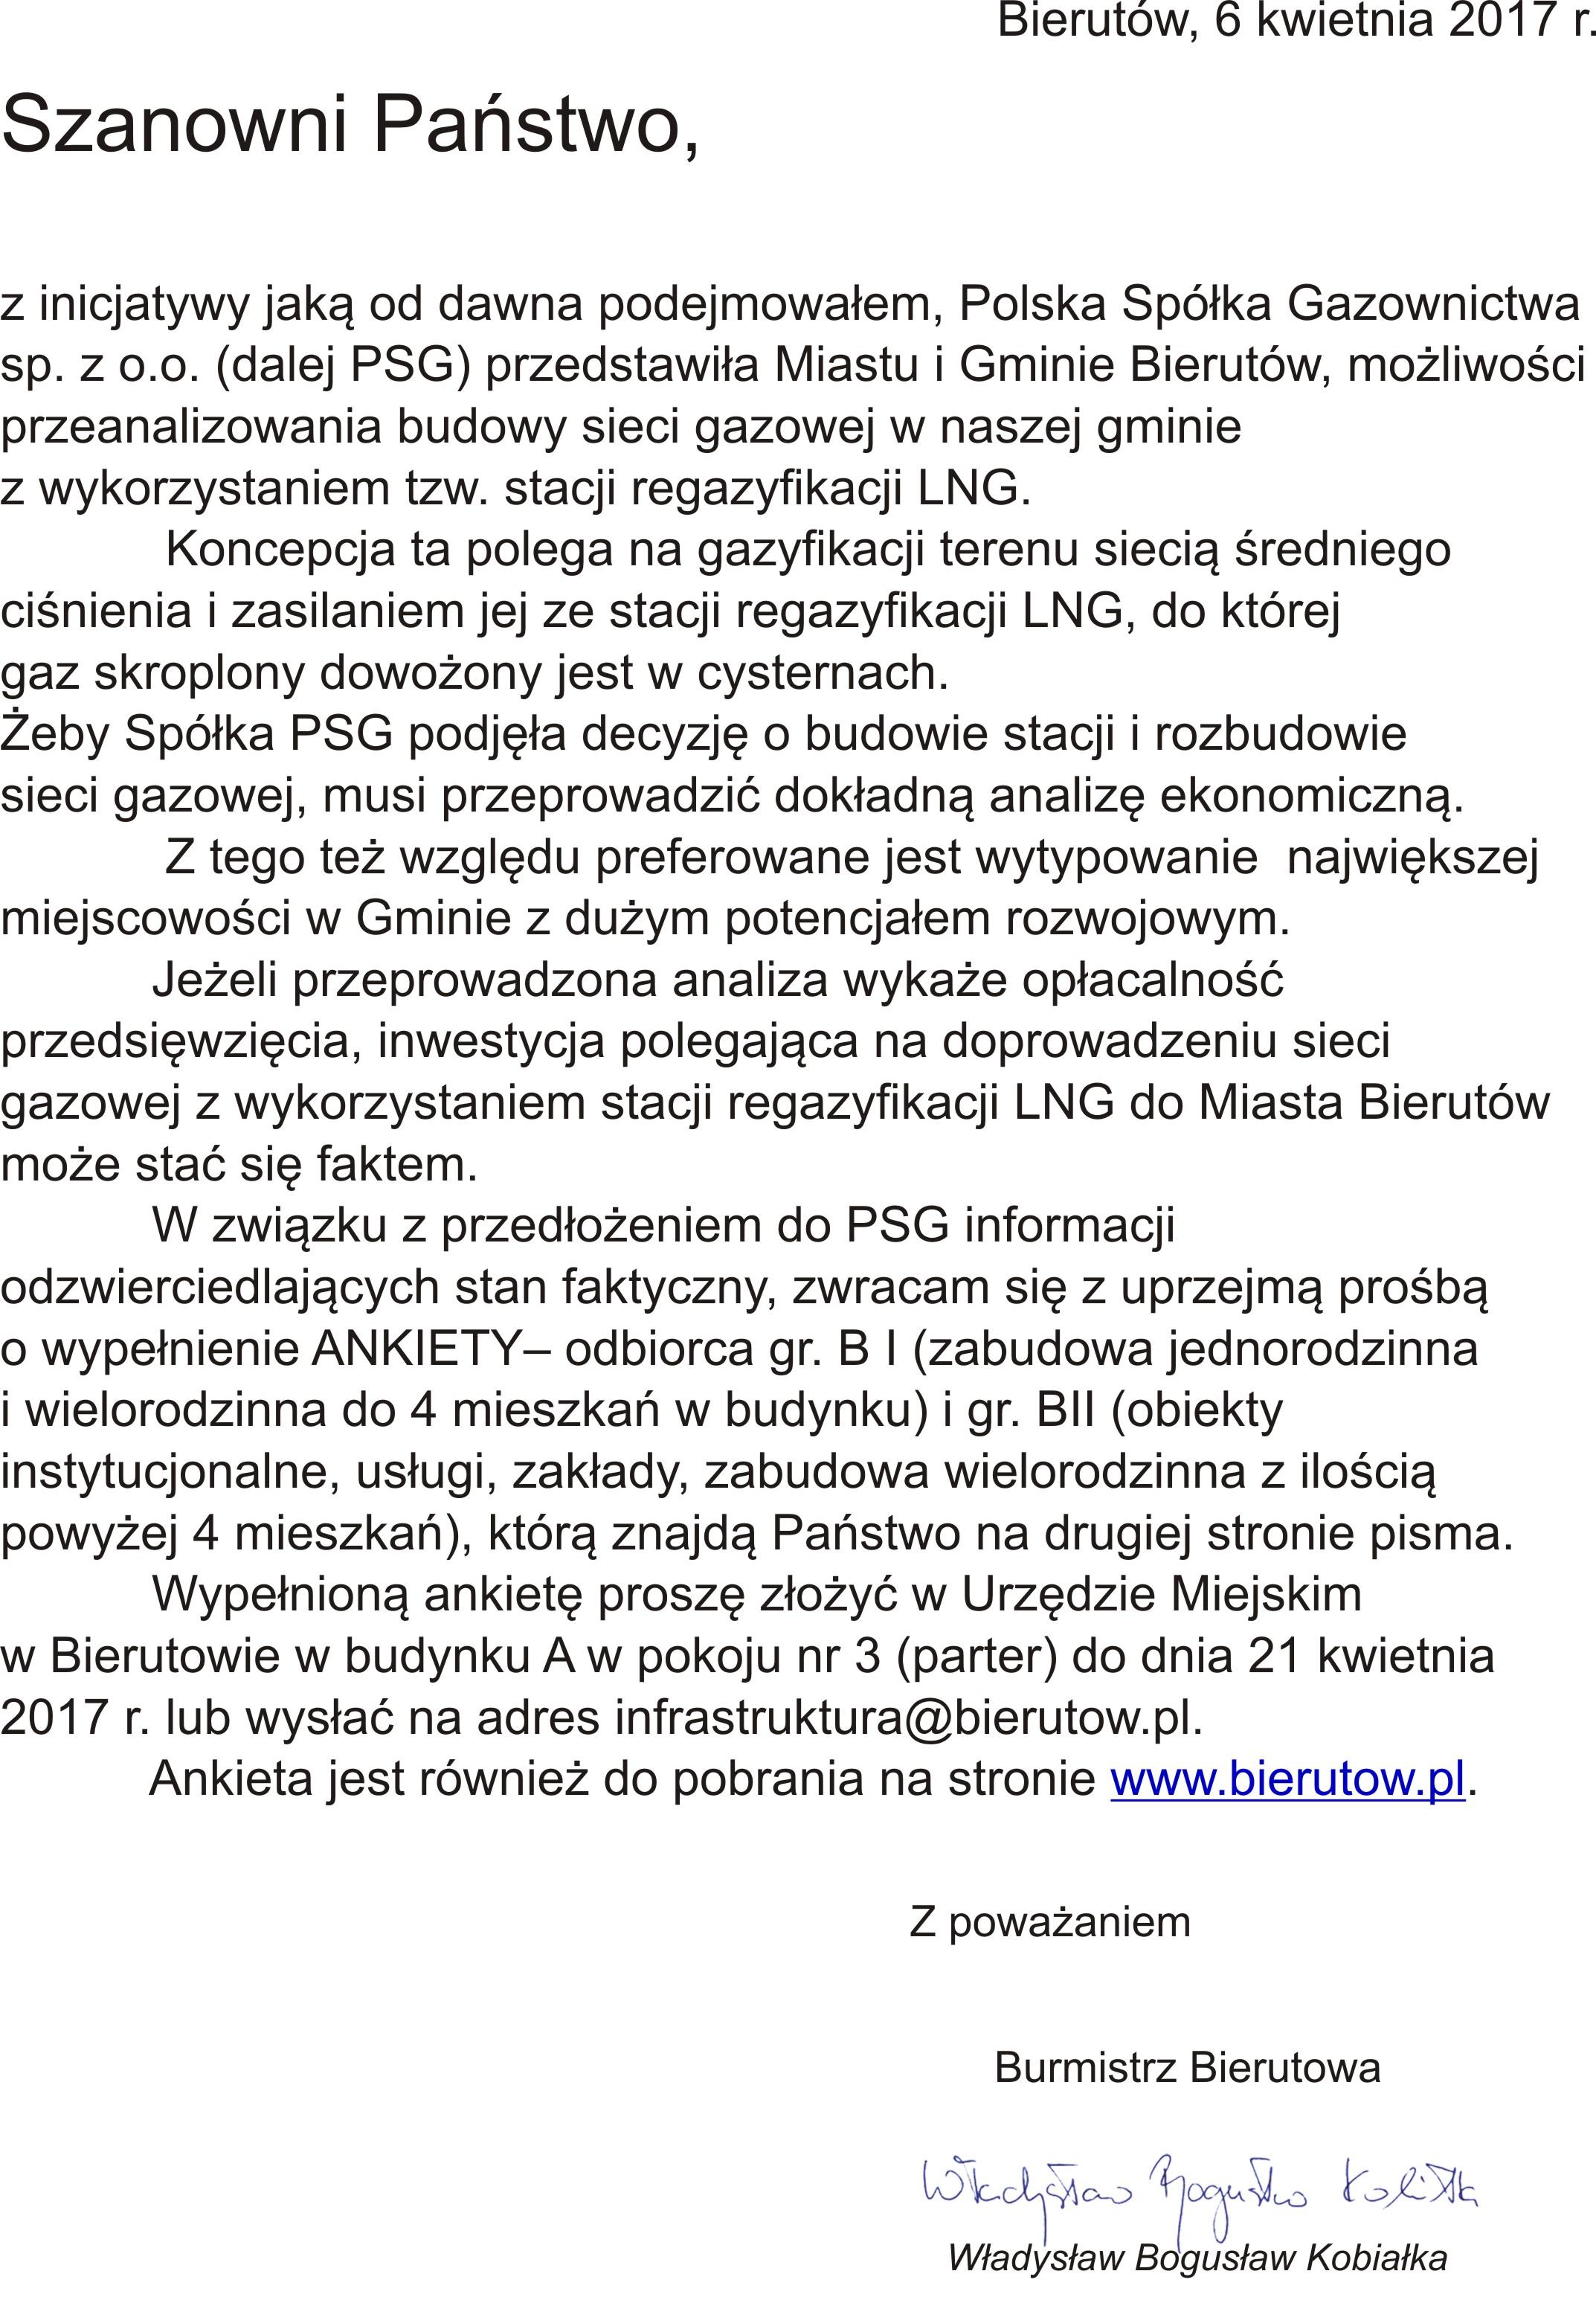 - ankieta_gaz1.jpg